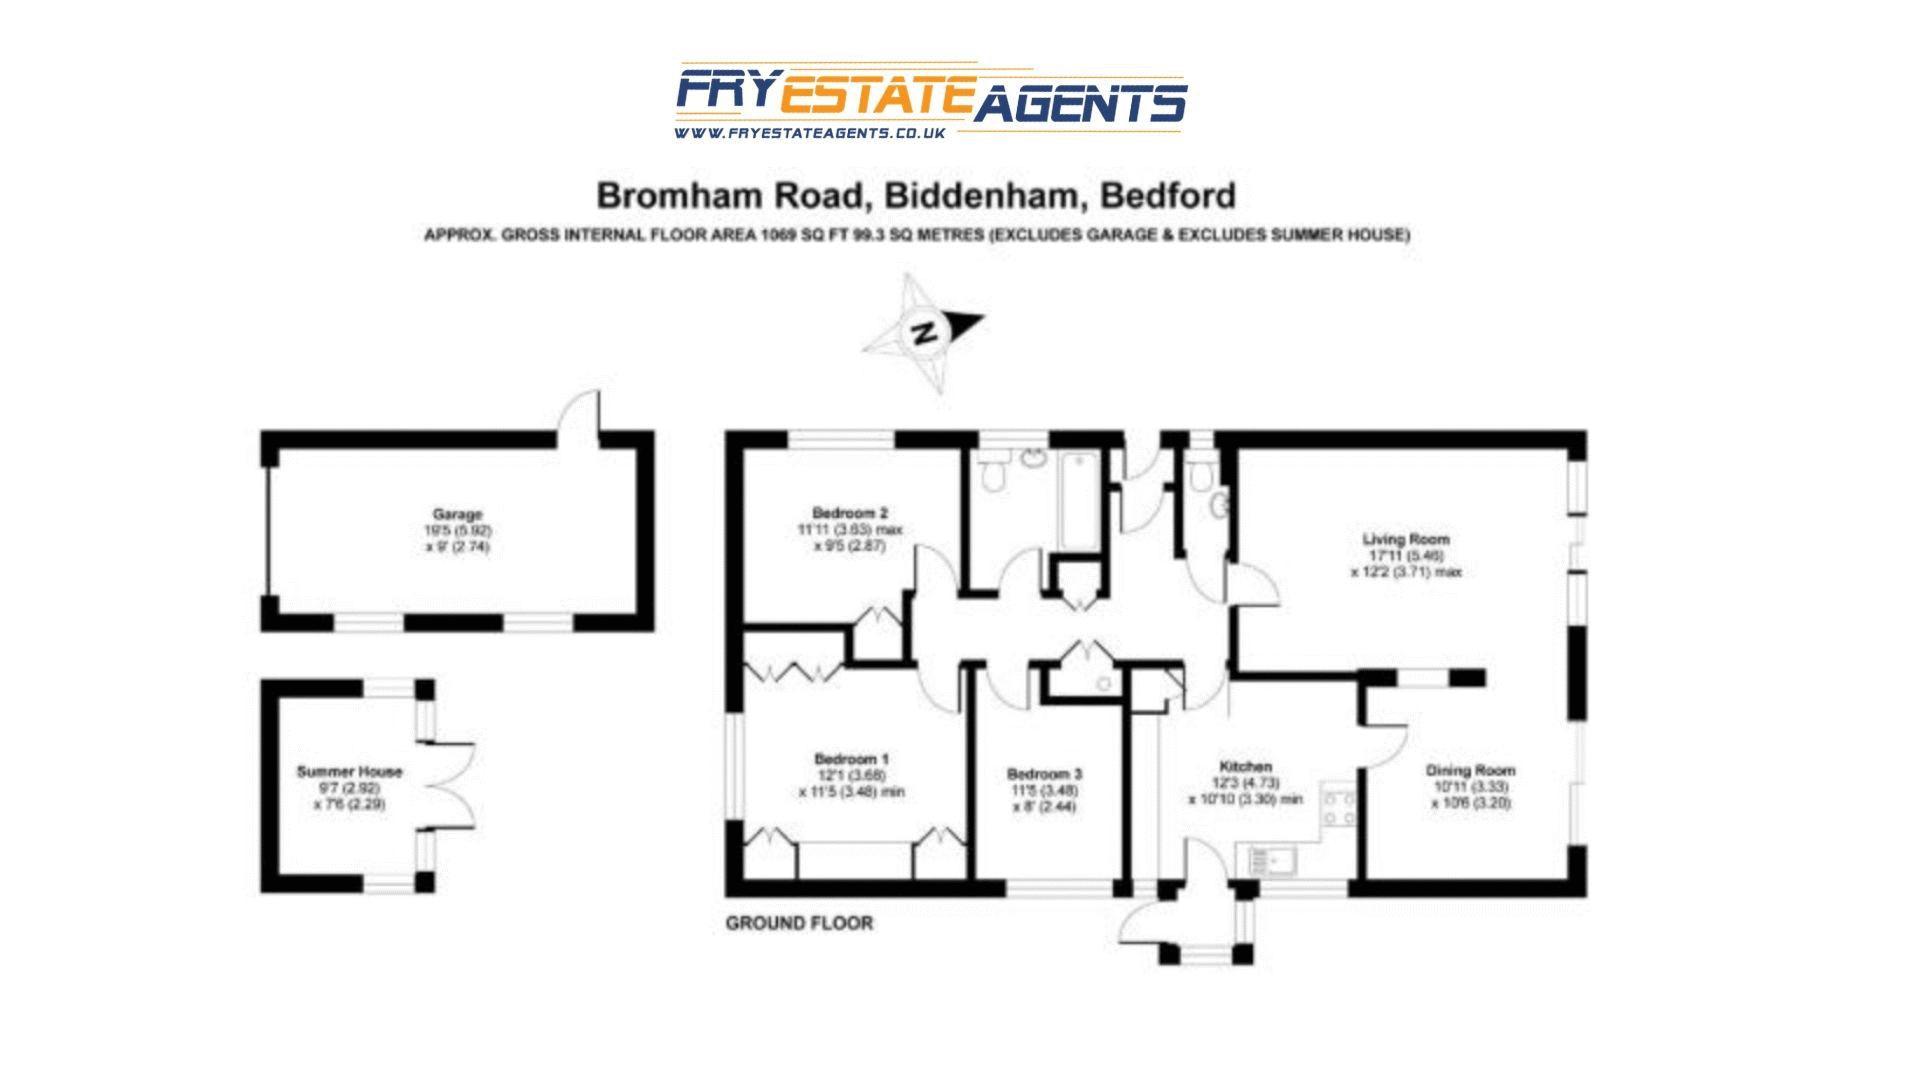 Bromham Road Biddenham